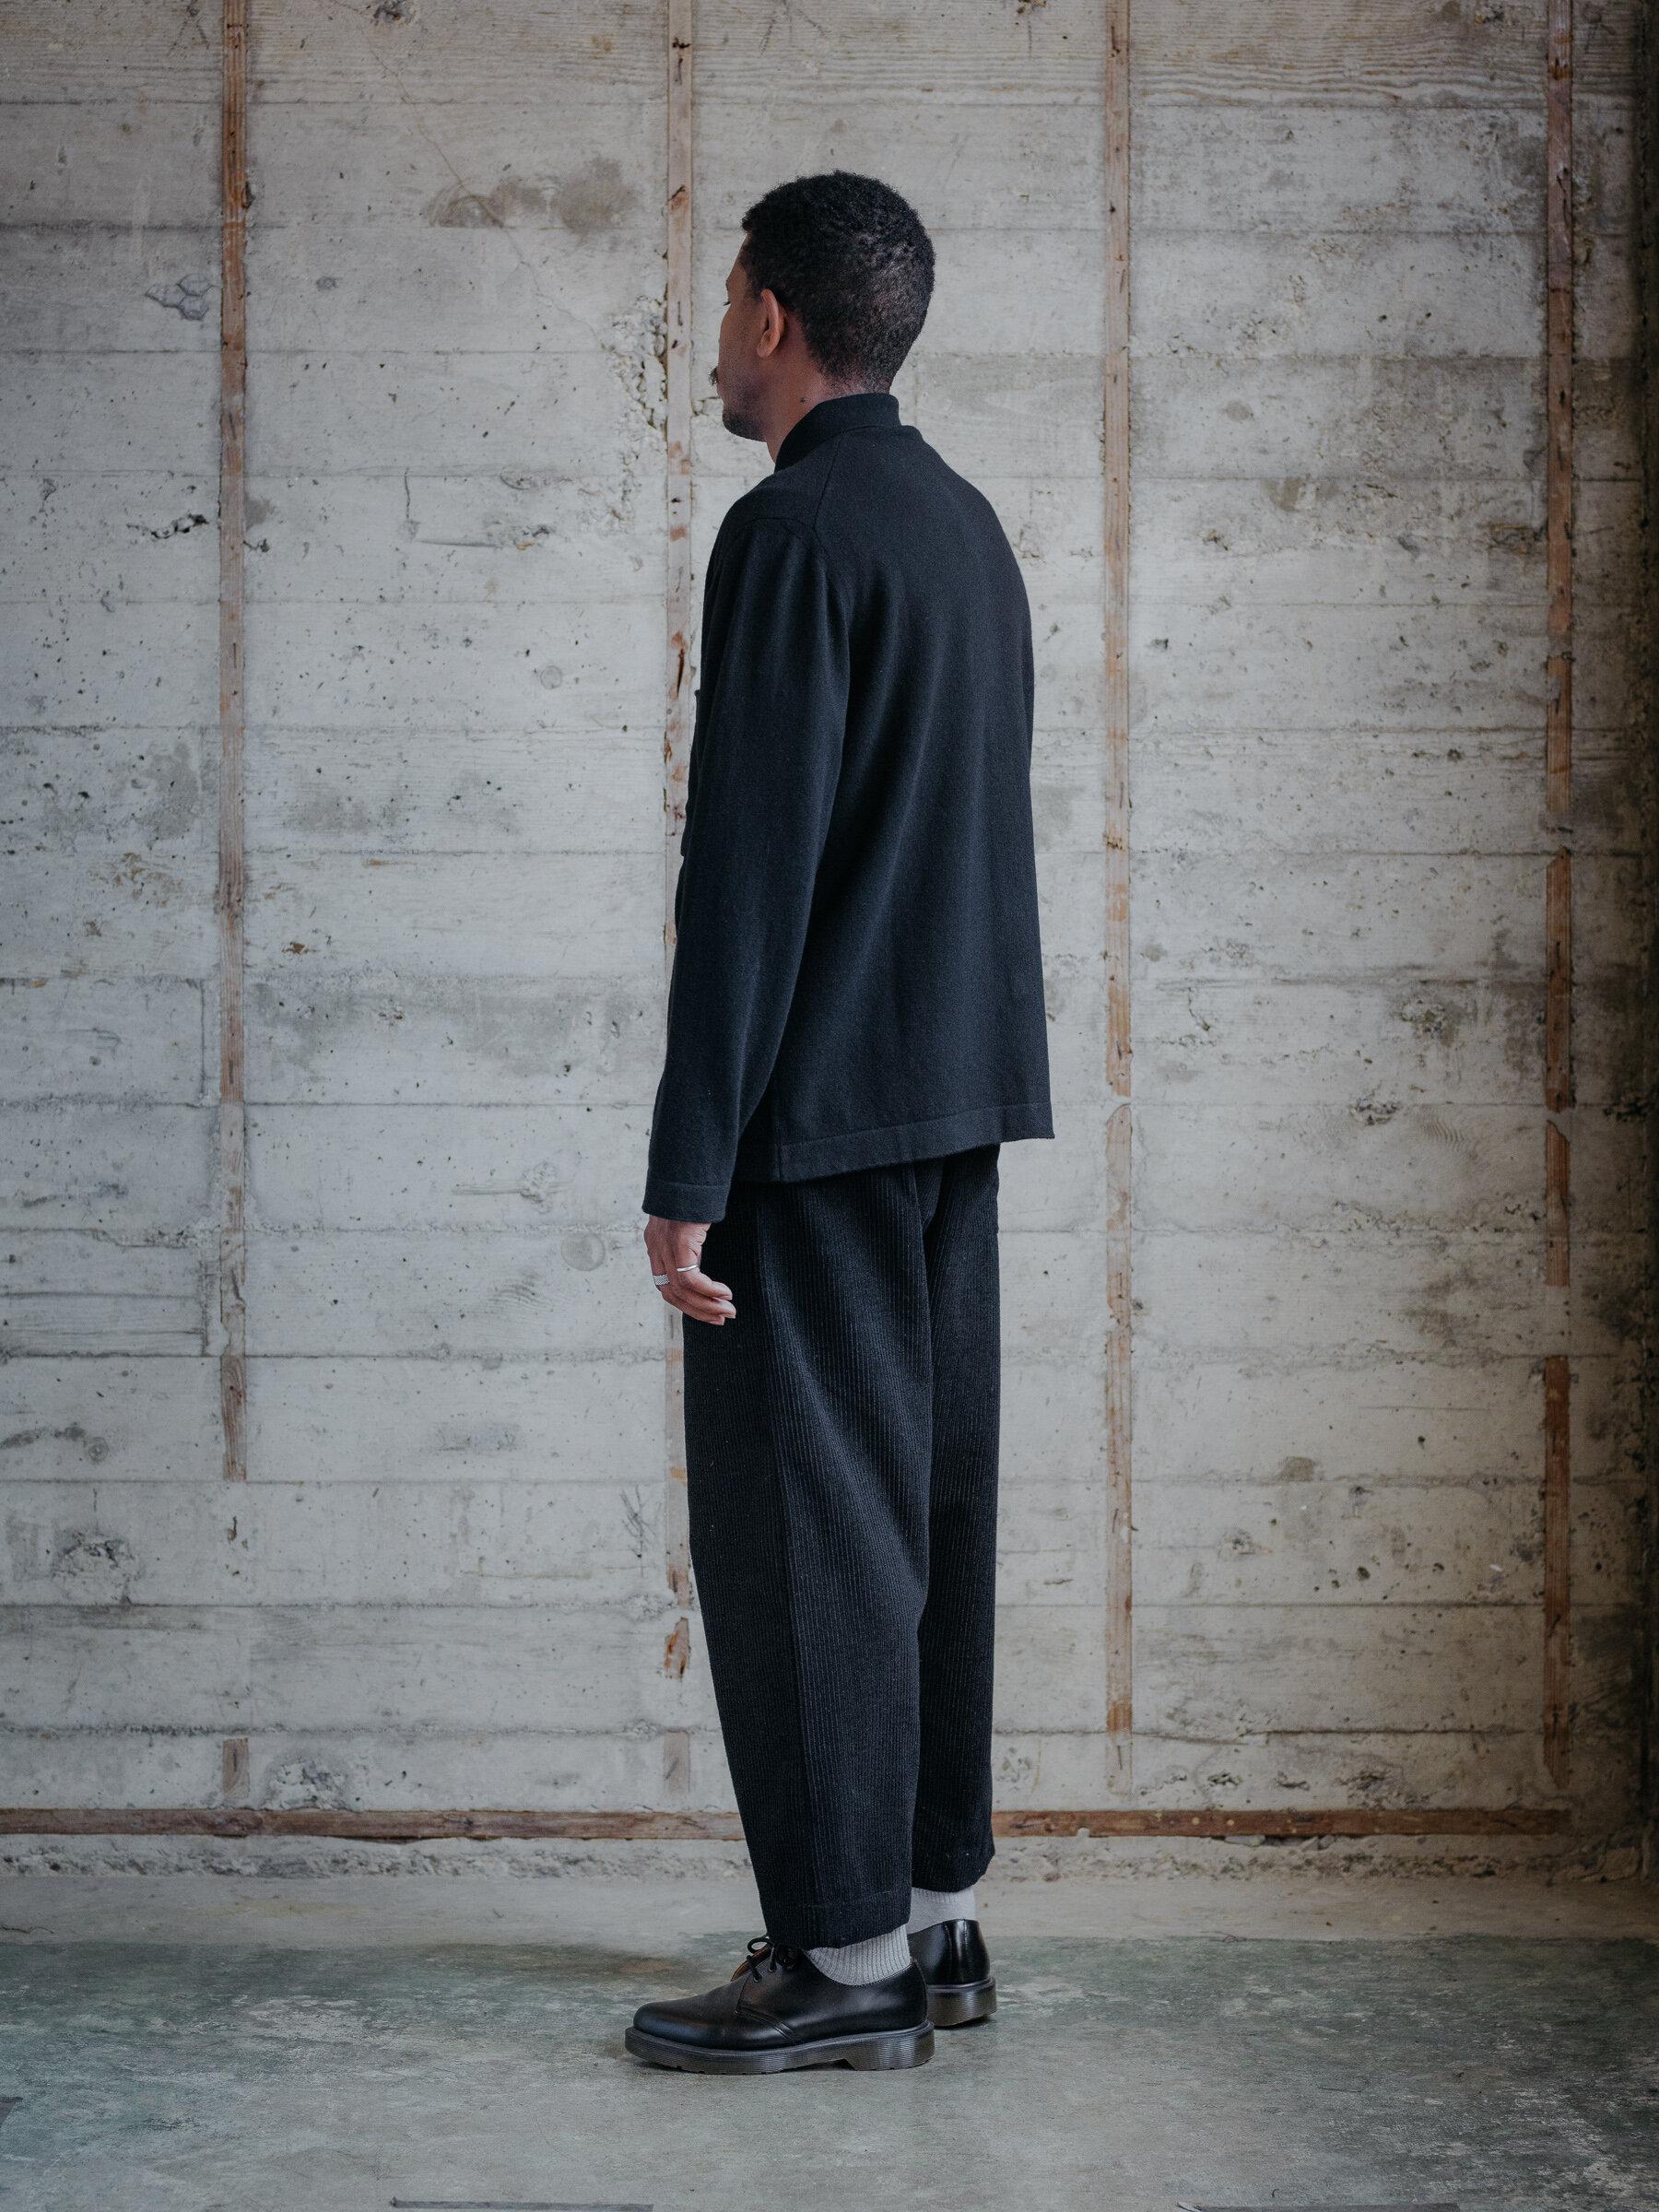 evan-kinori-knit-shirt-cashmere-lambswool-made-in-italy-5